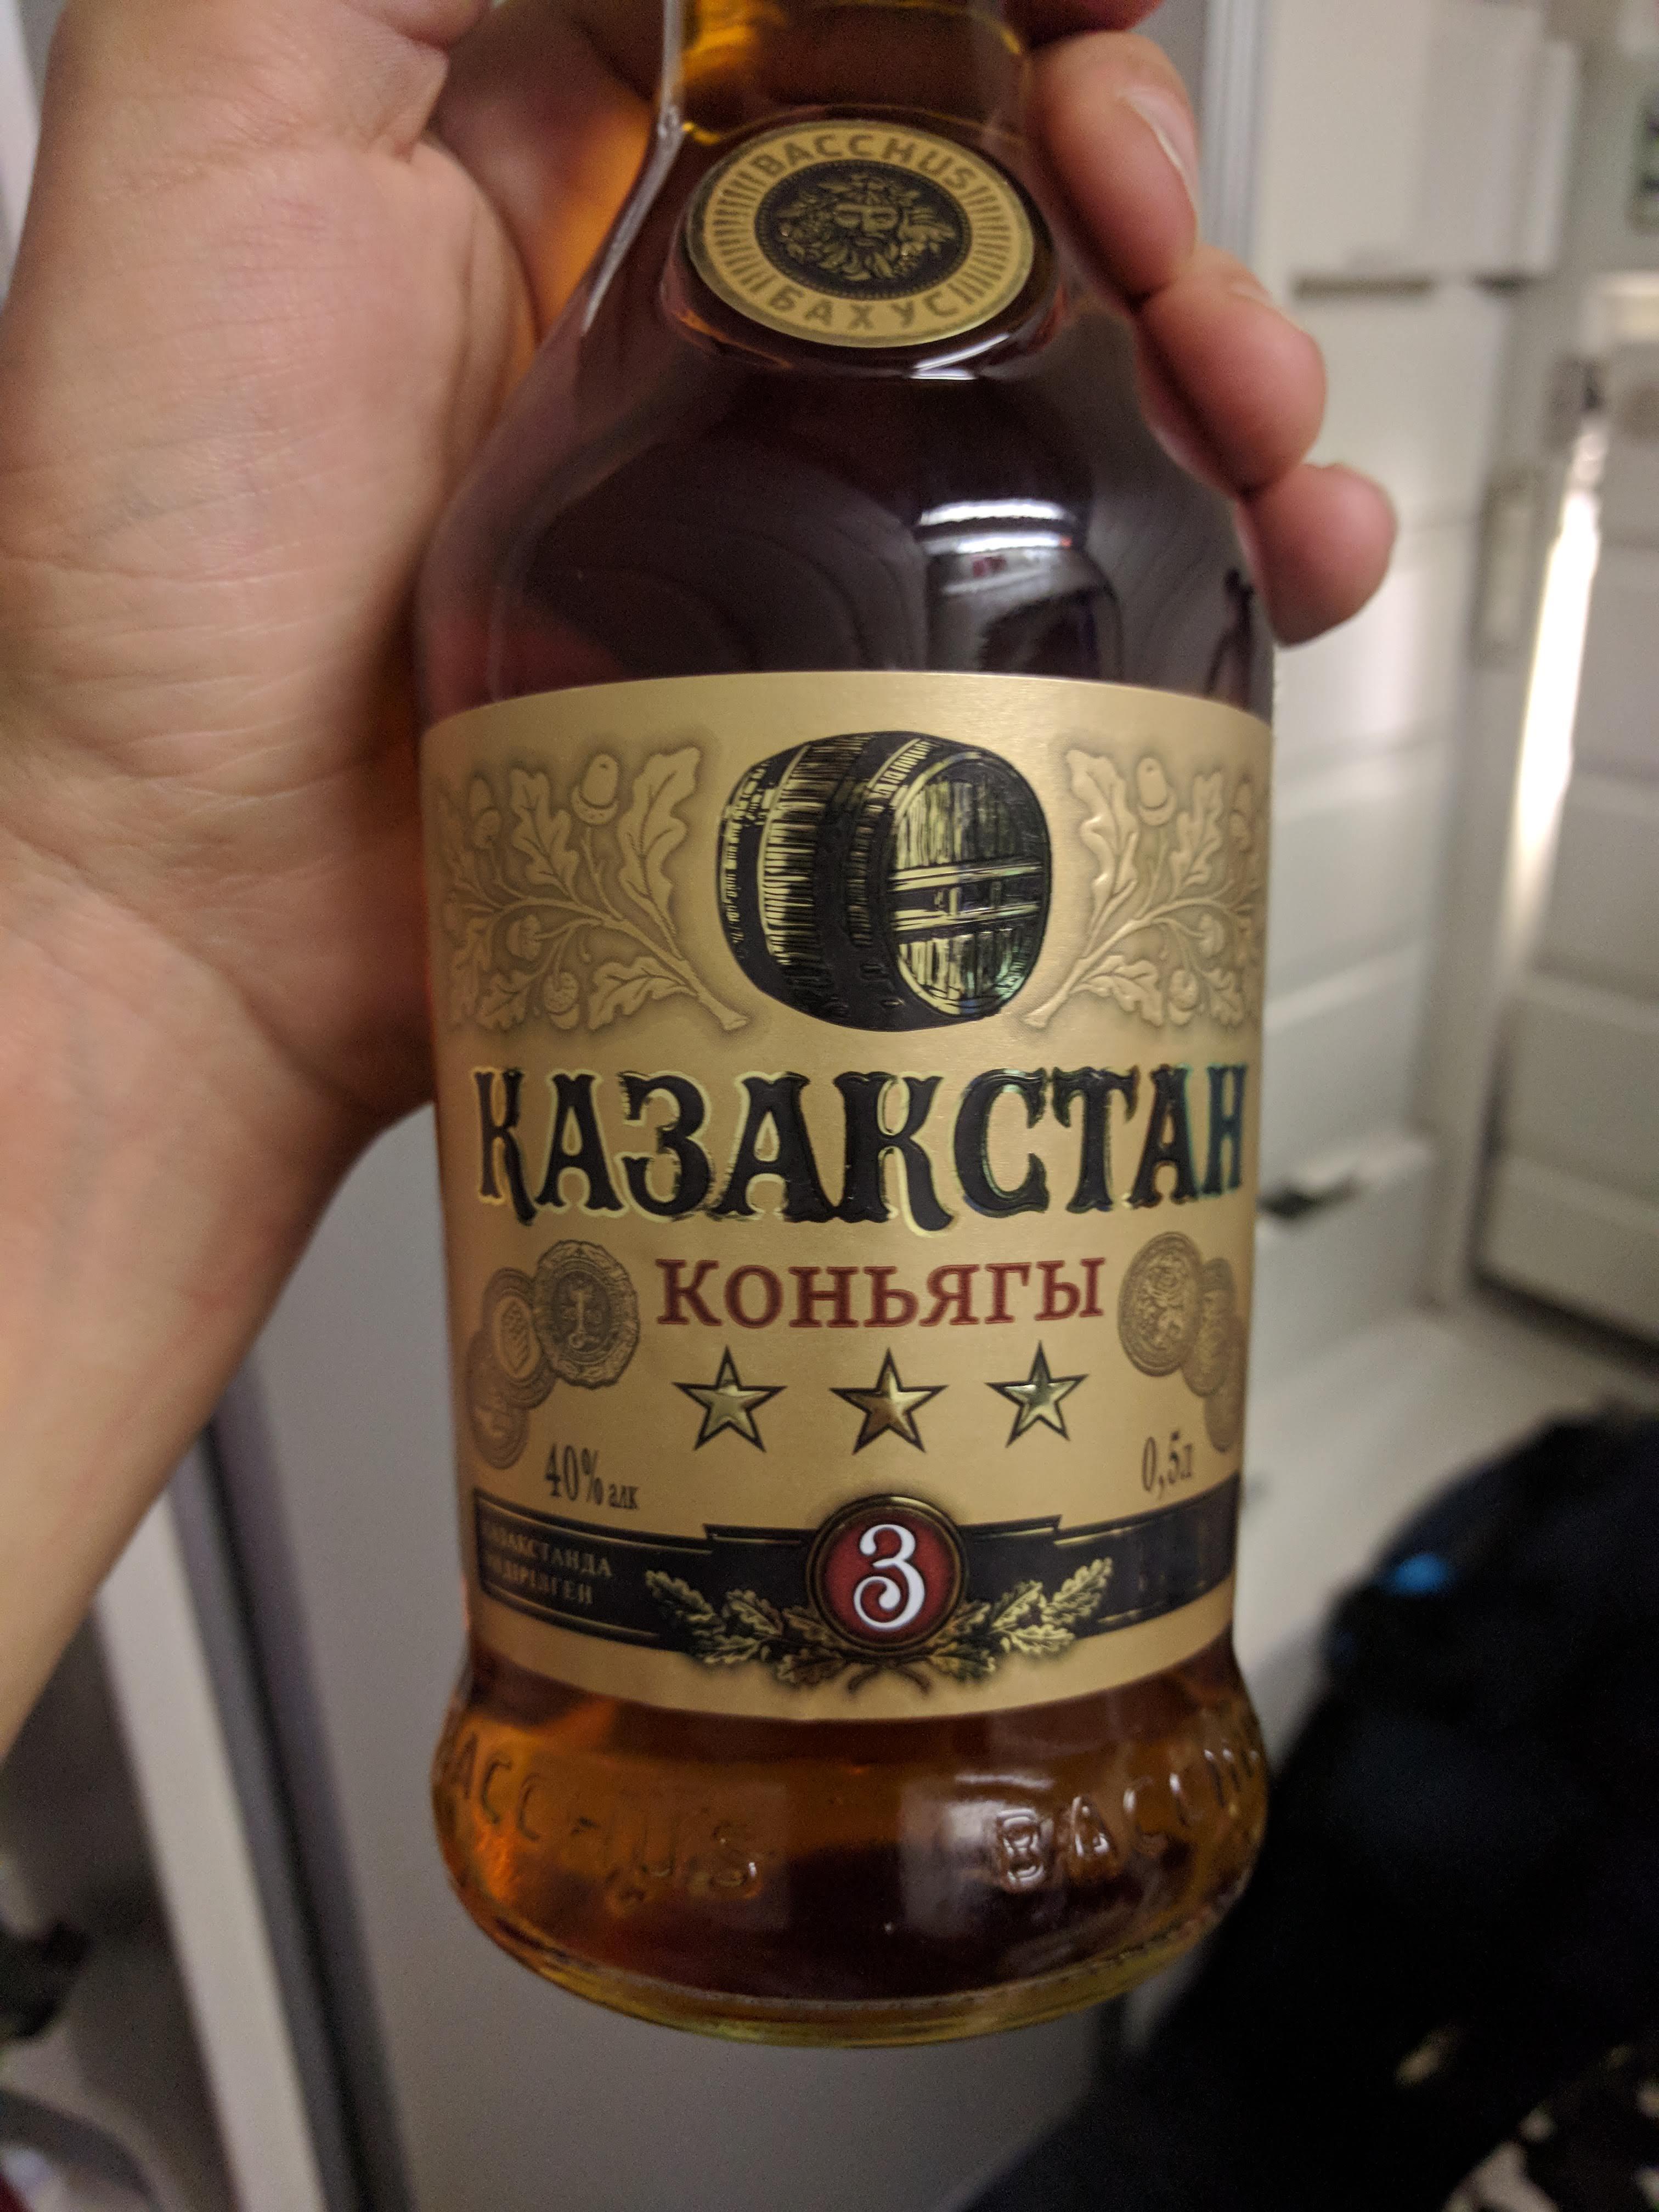 kazachstan cognac